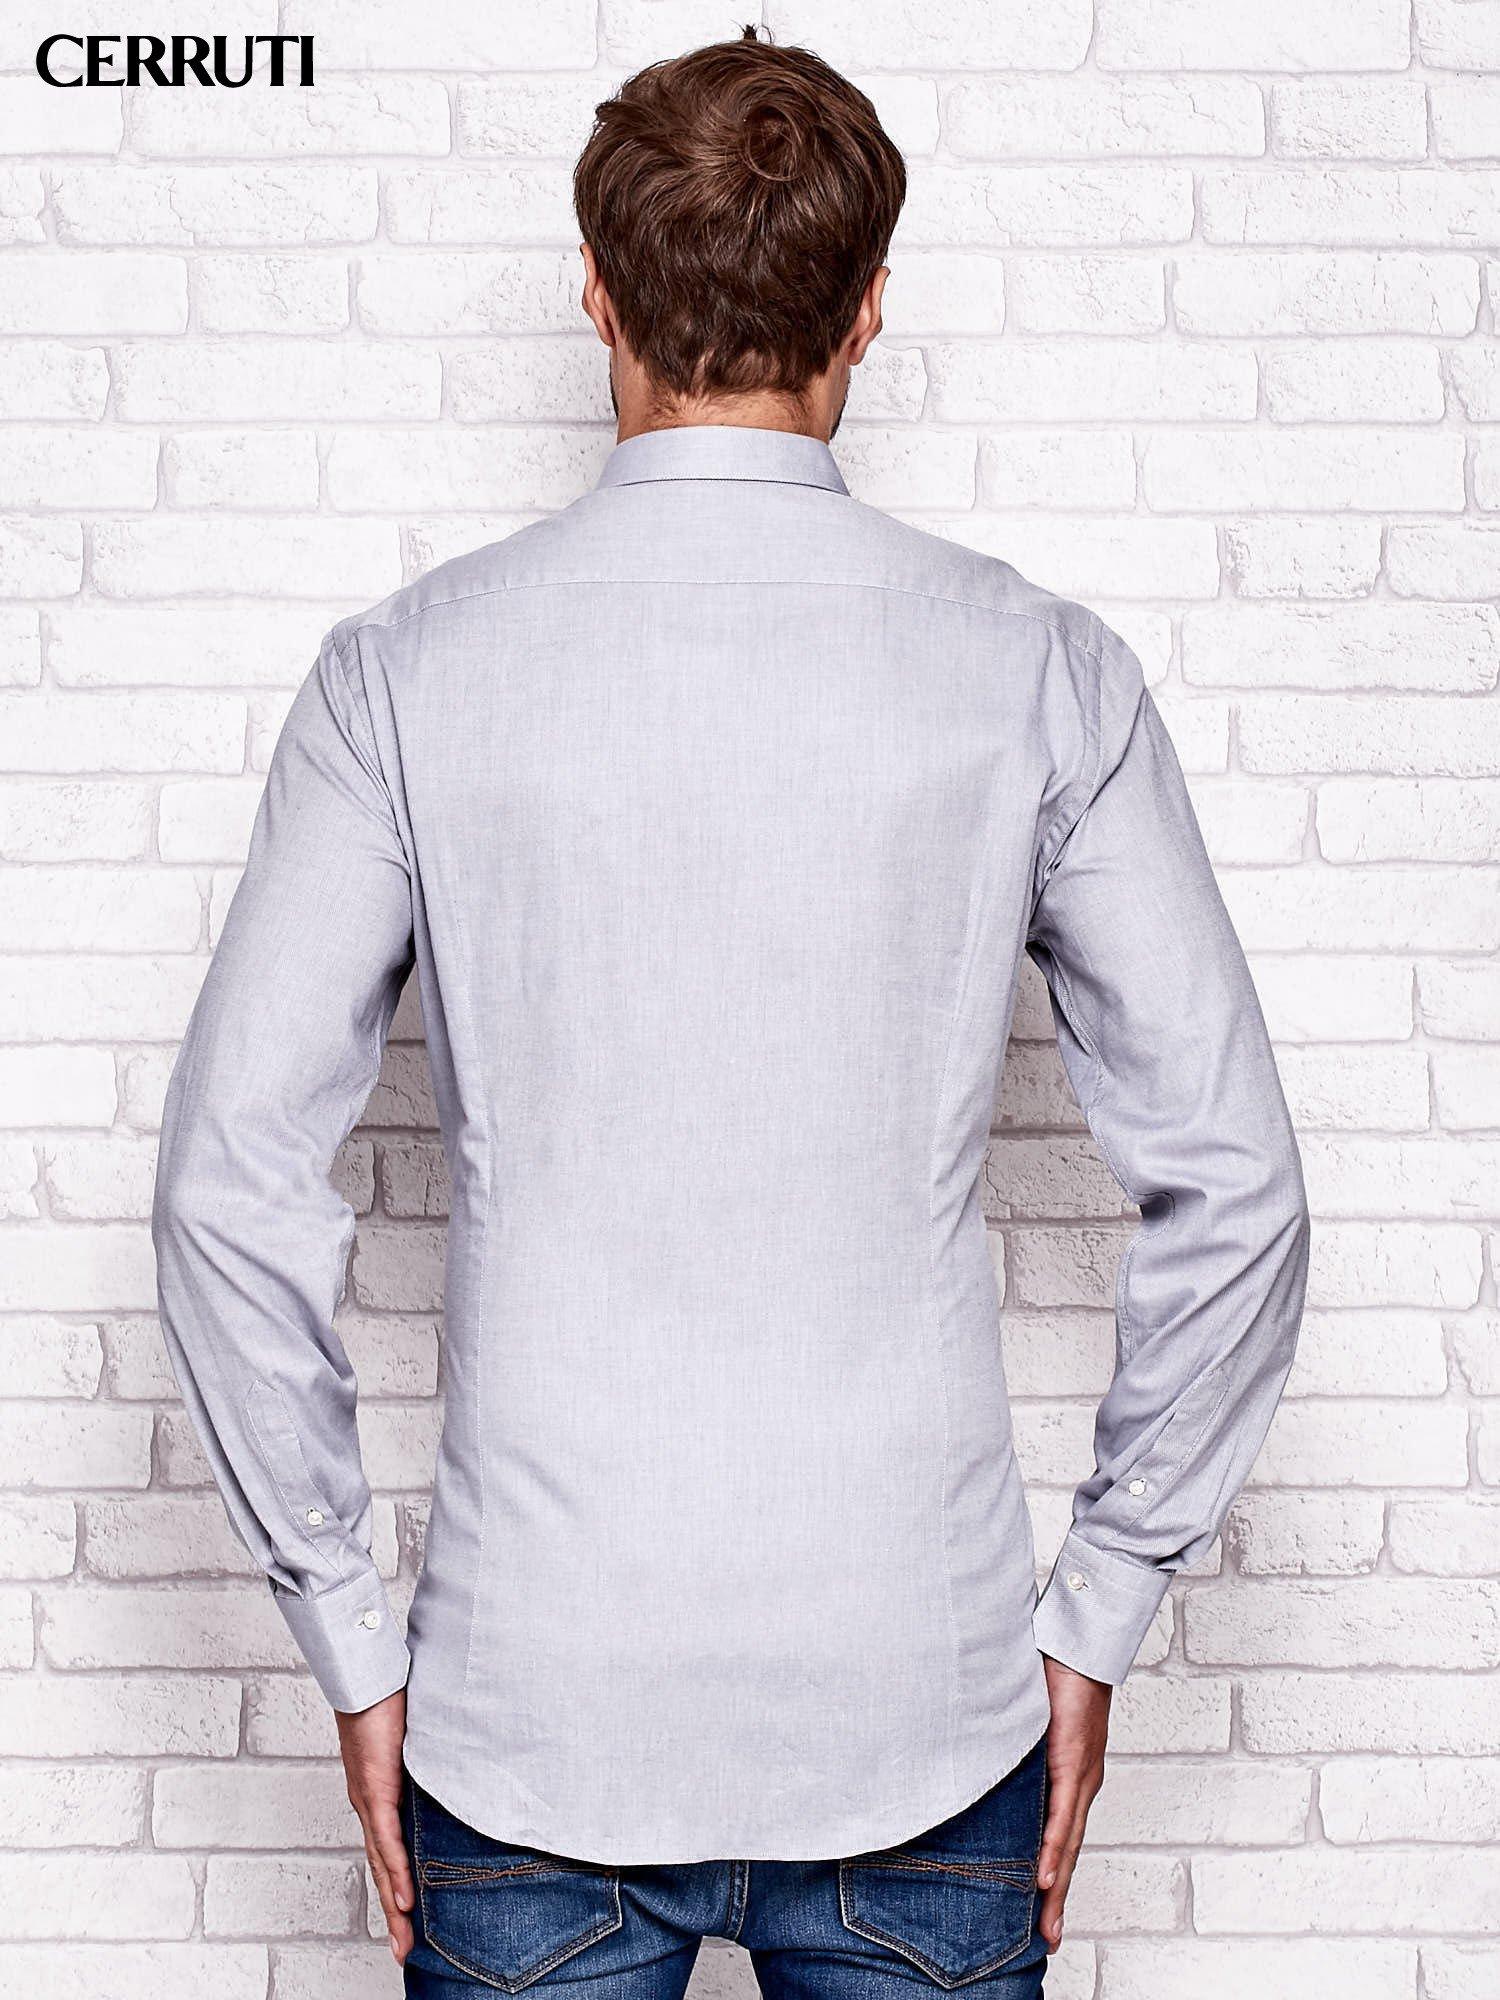 494a362abec3 CERRUTI Jasnoszara koszula męska - Mężczyźni koszula męska - sklep ...